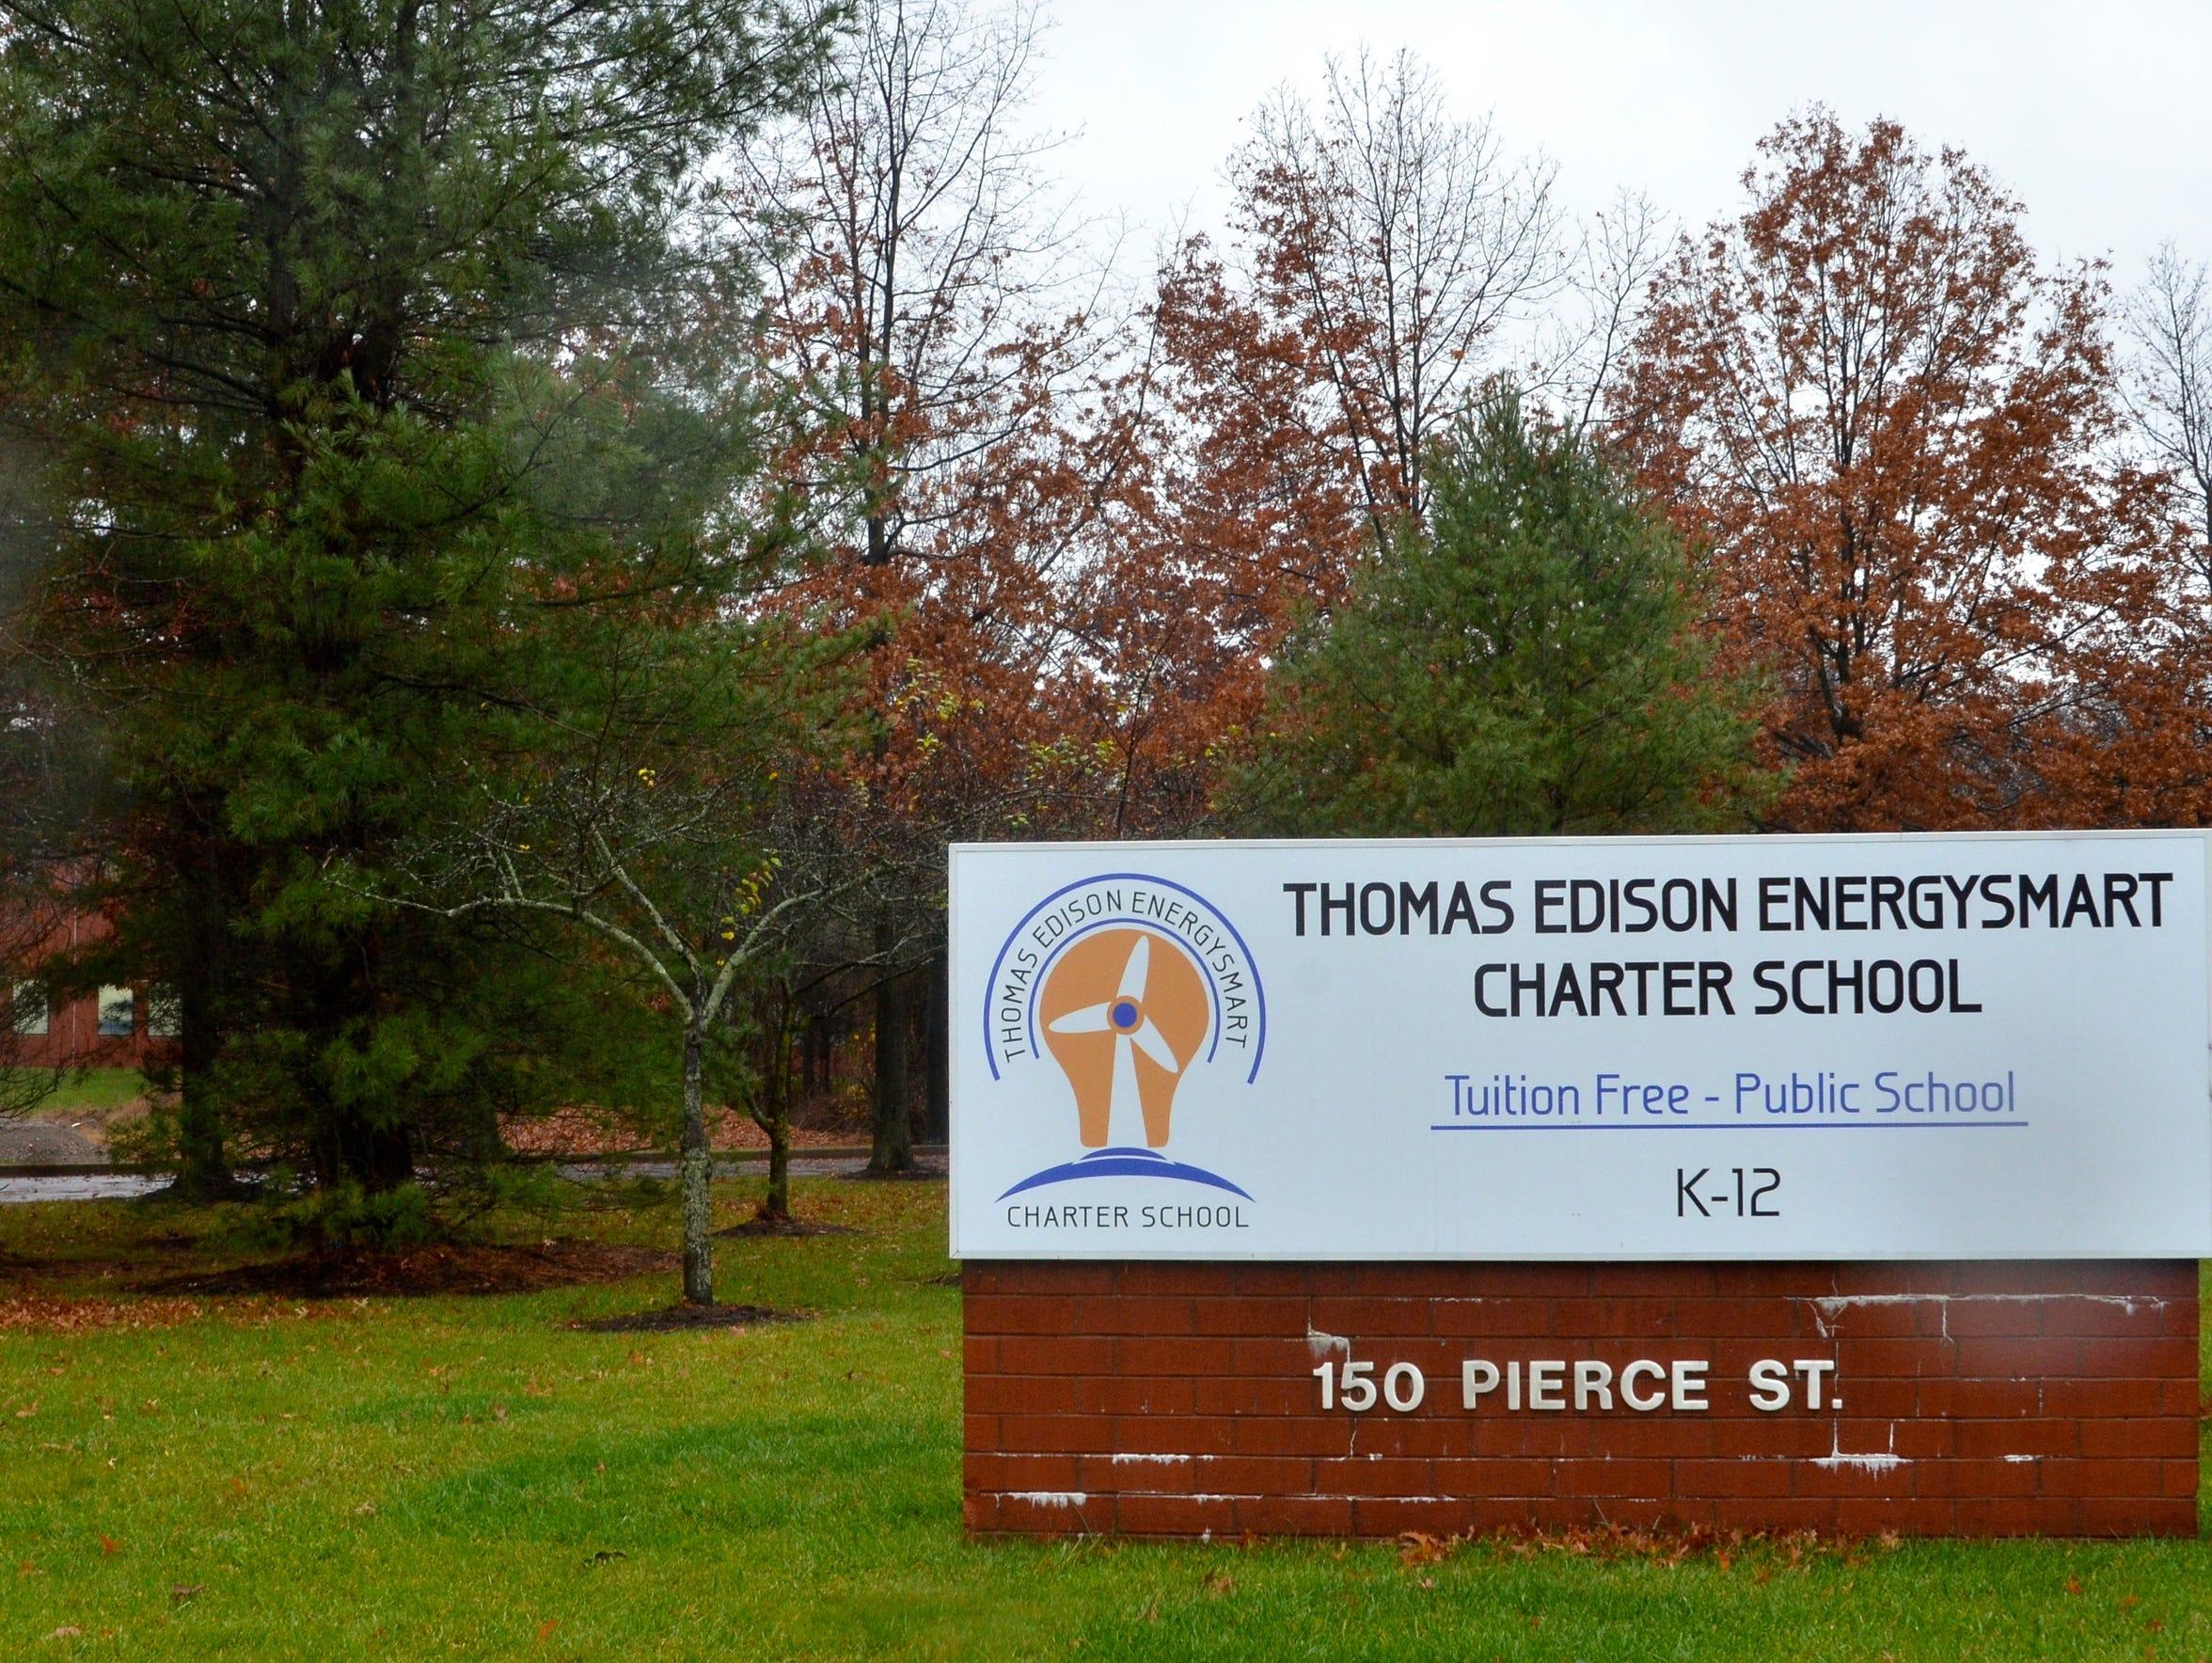 Thomas Edison Energy Smart Charter School  150 Pierce